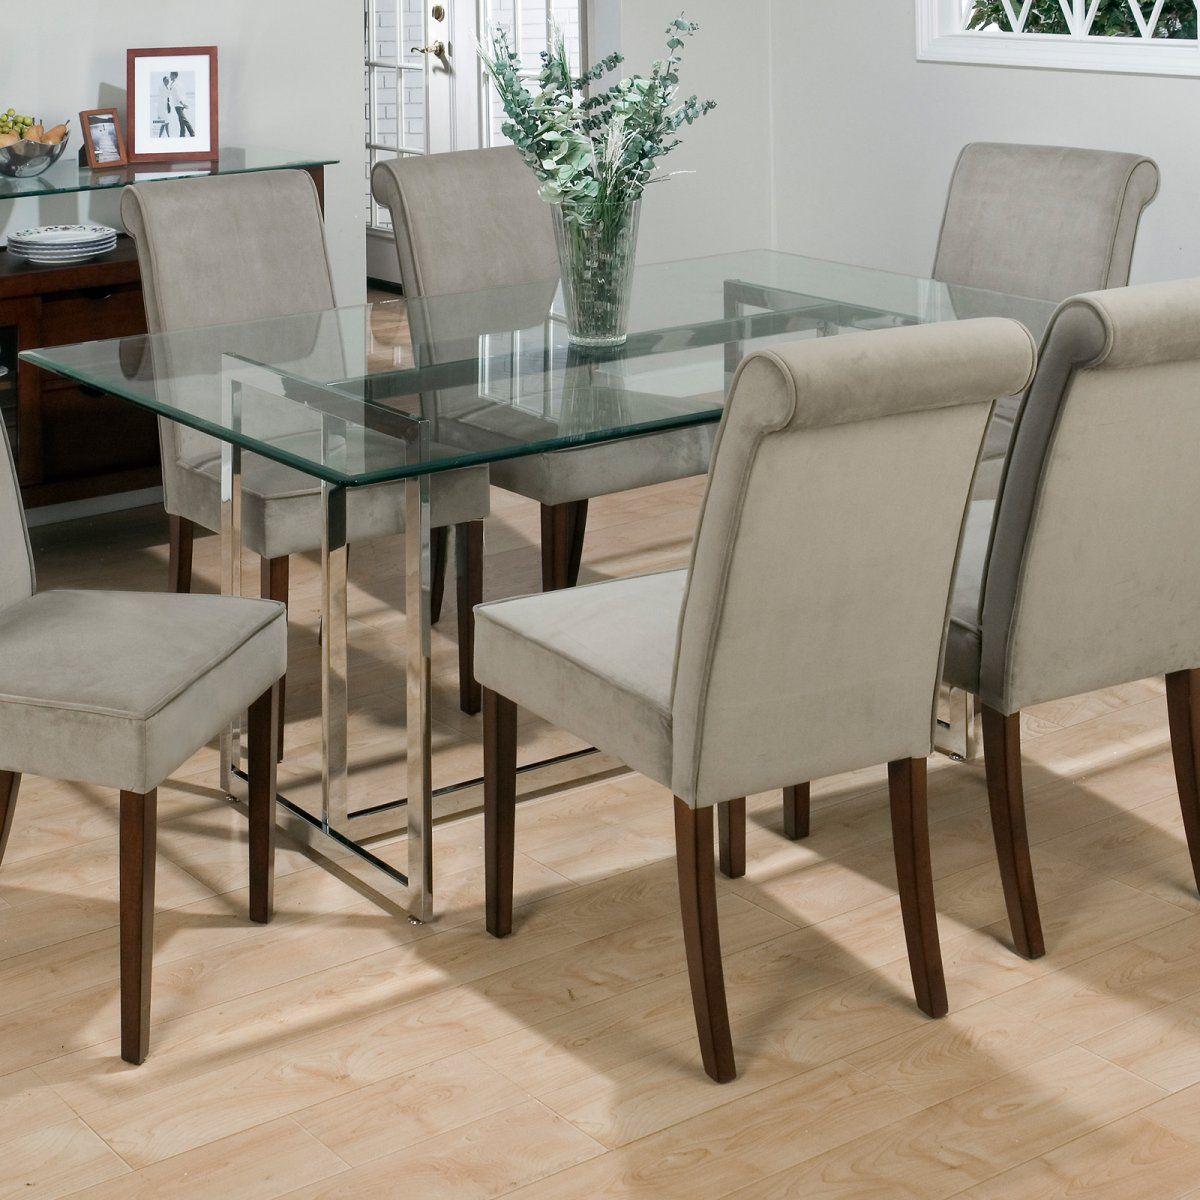 Jofran Bethel Rectanglar Glass Top Dining Table At Hayneedle